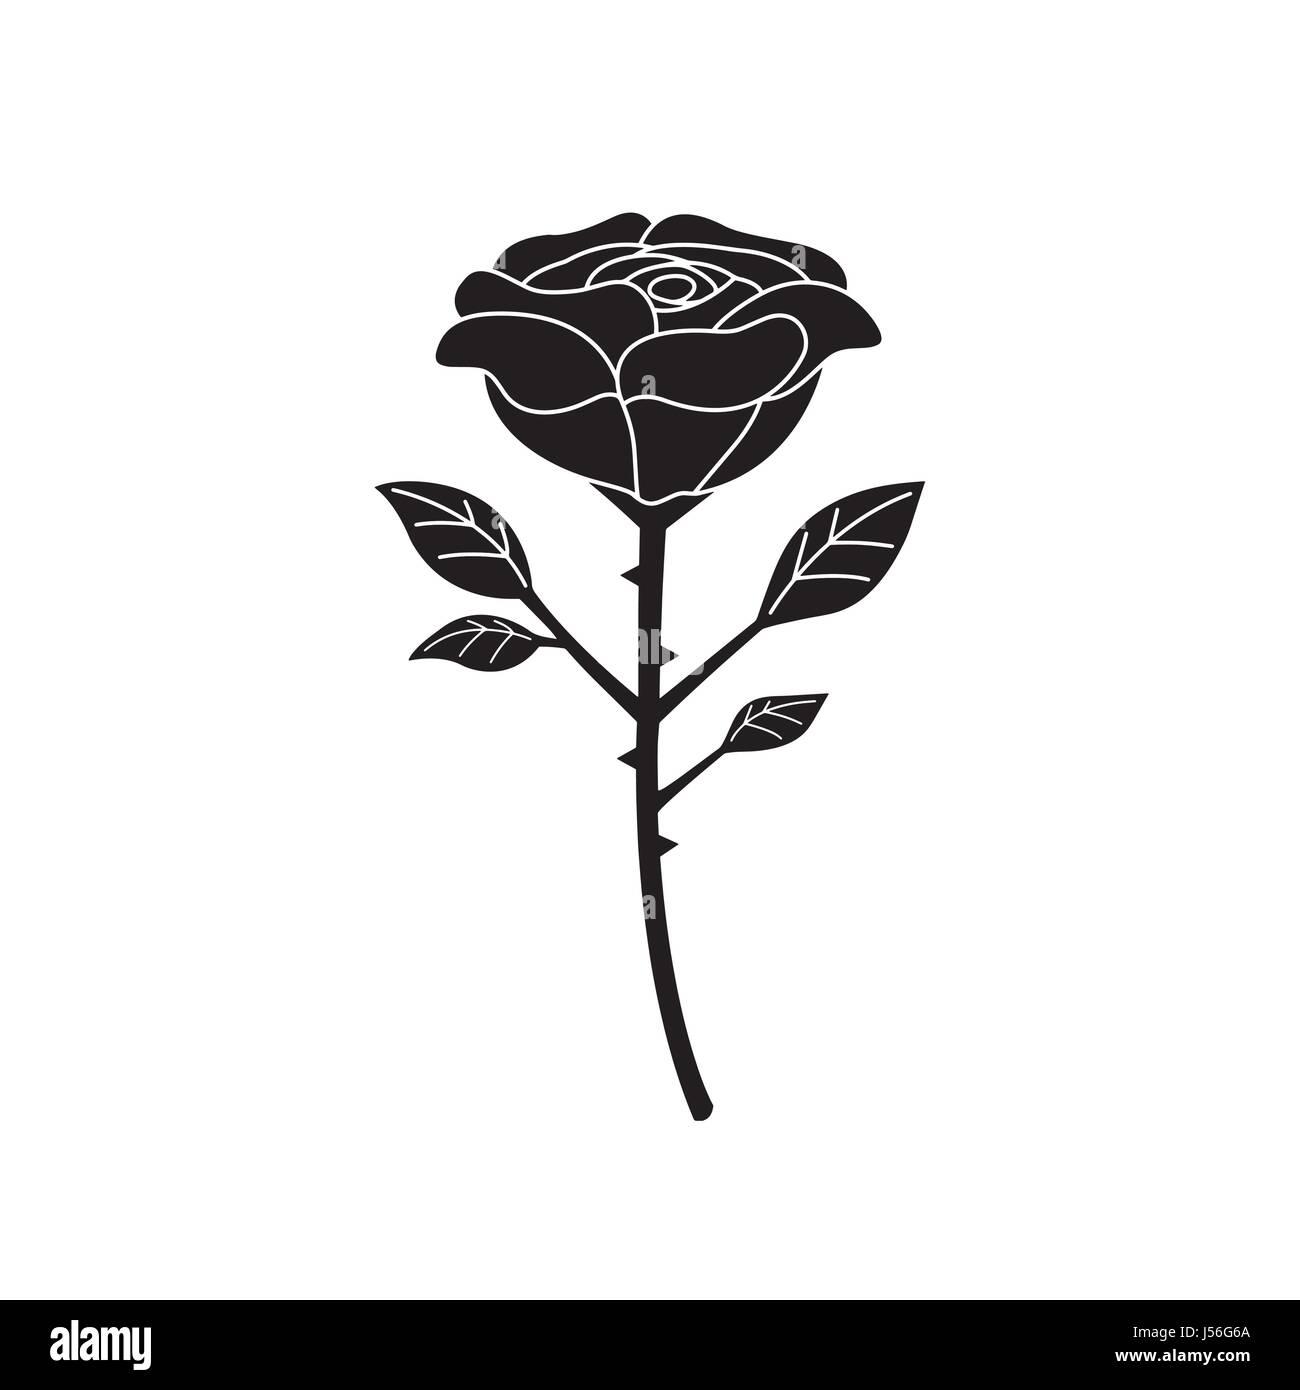 Rose Tattoo Design Stock Vector Art Illustration Vector Image